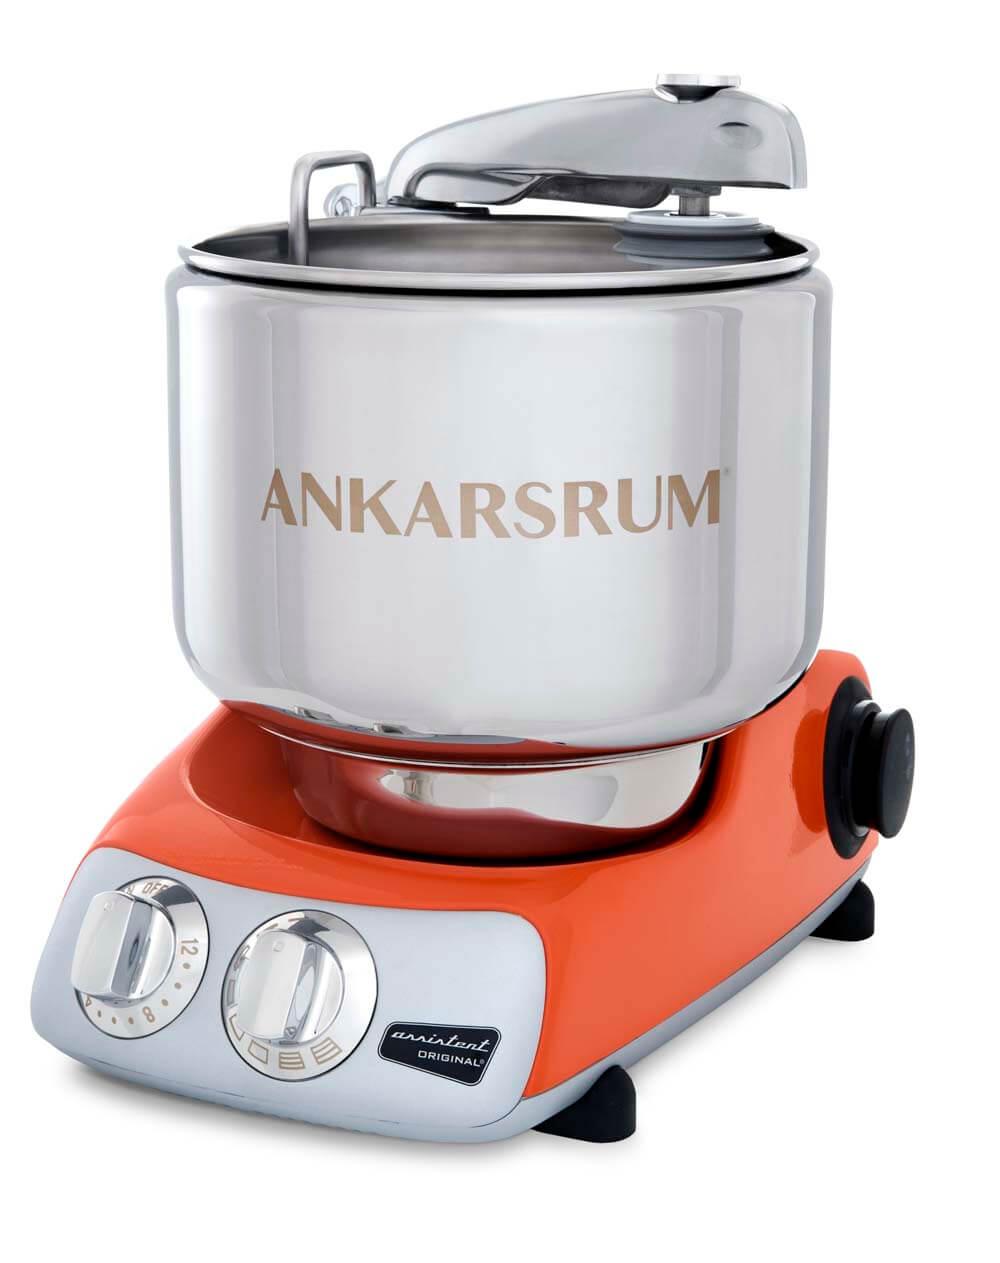 Ankarsrum Assistent Basis Pure Orange